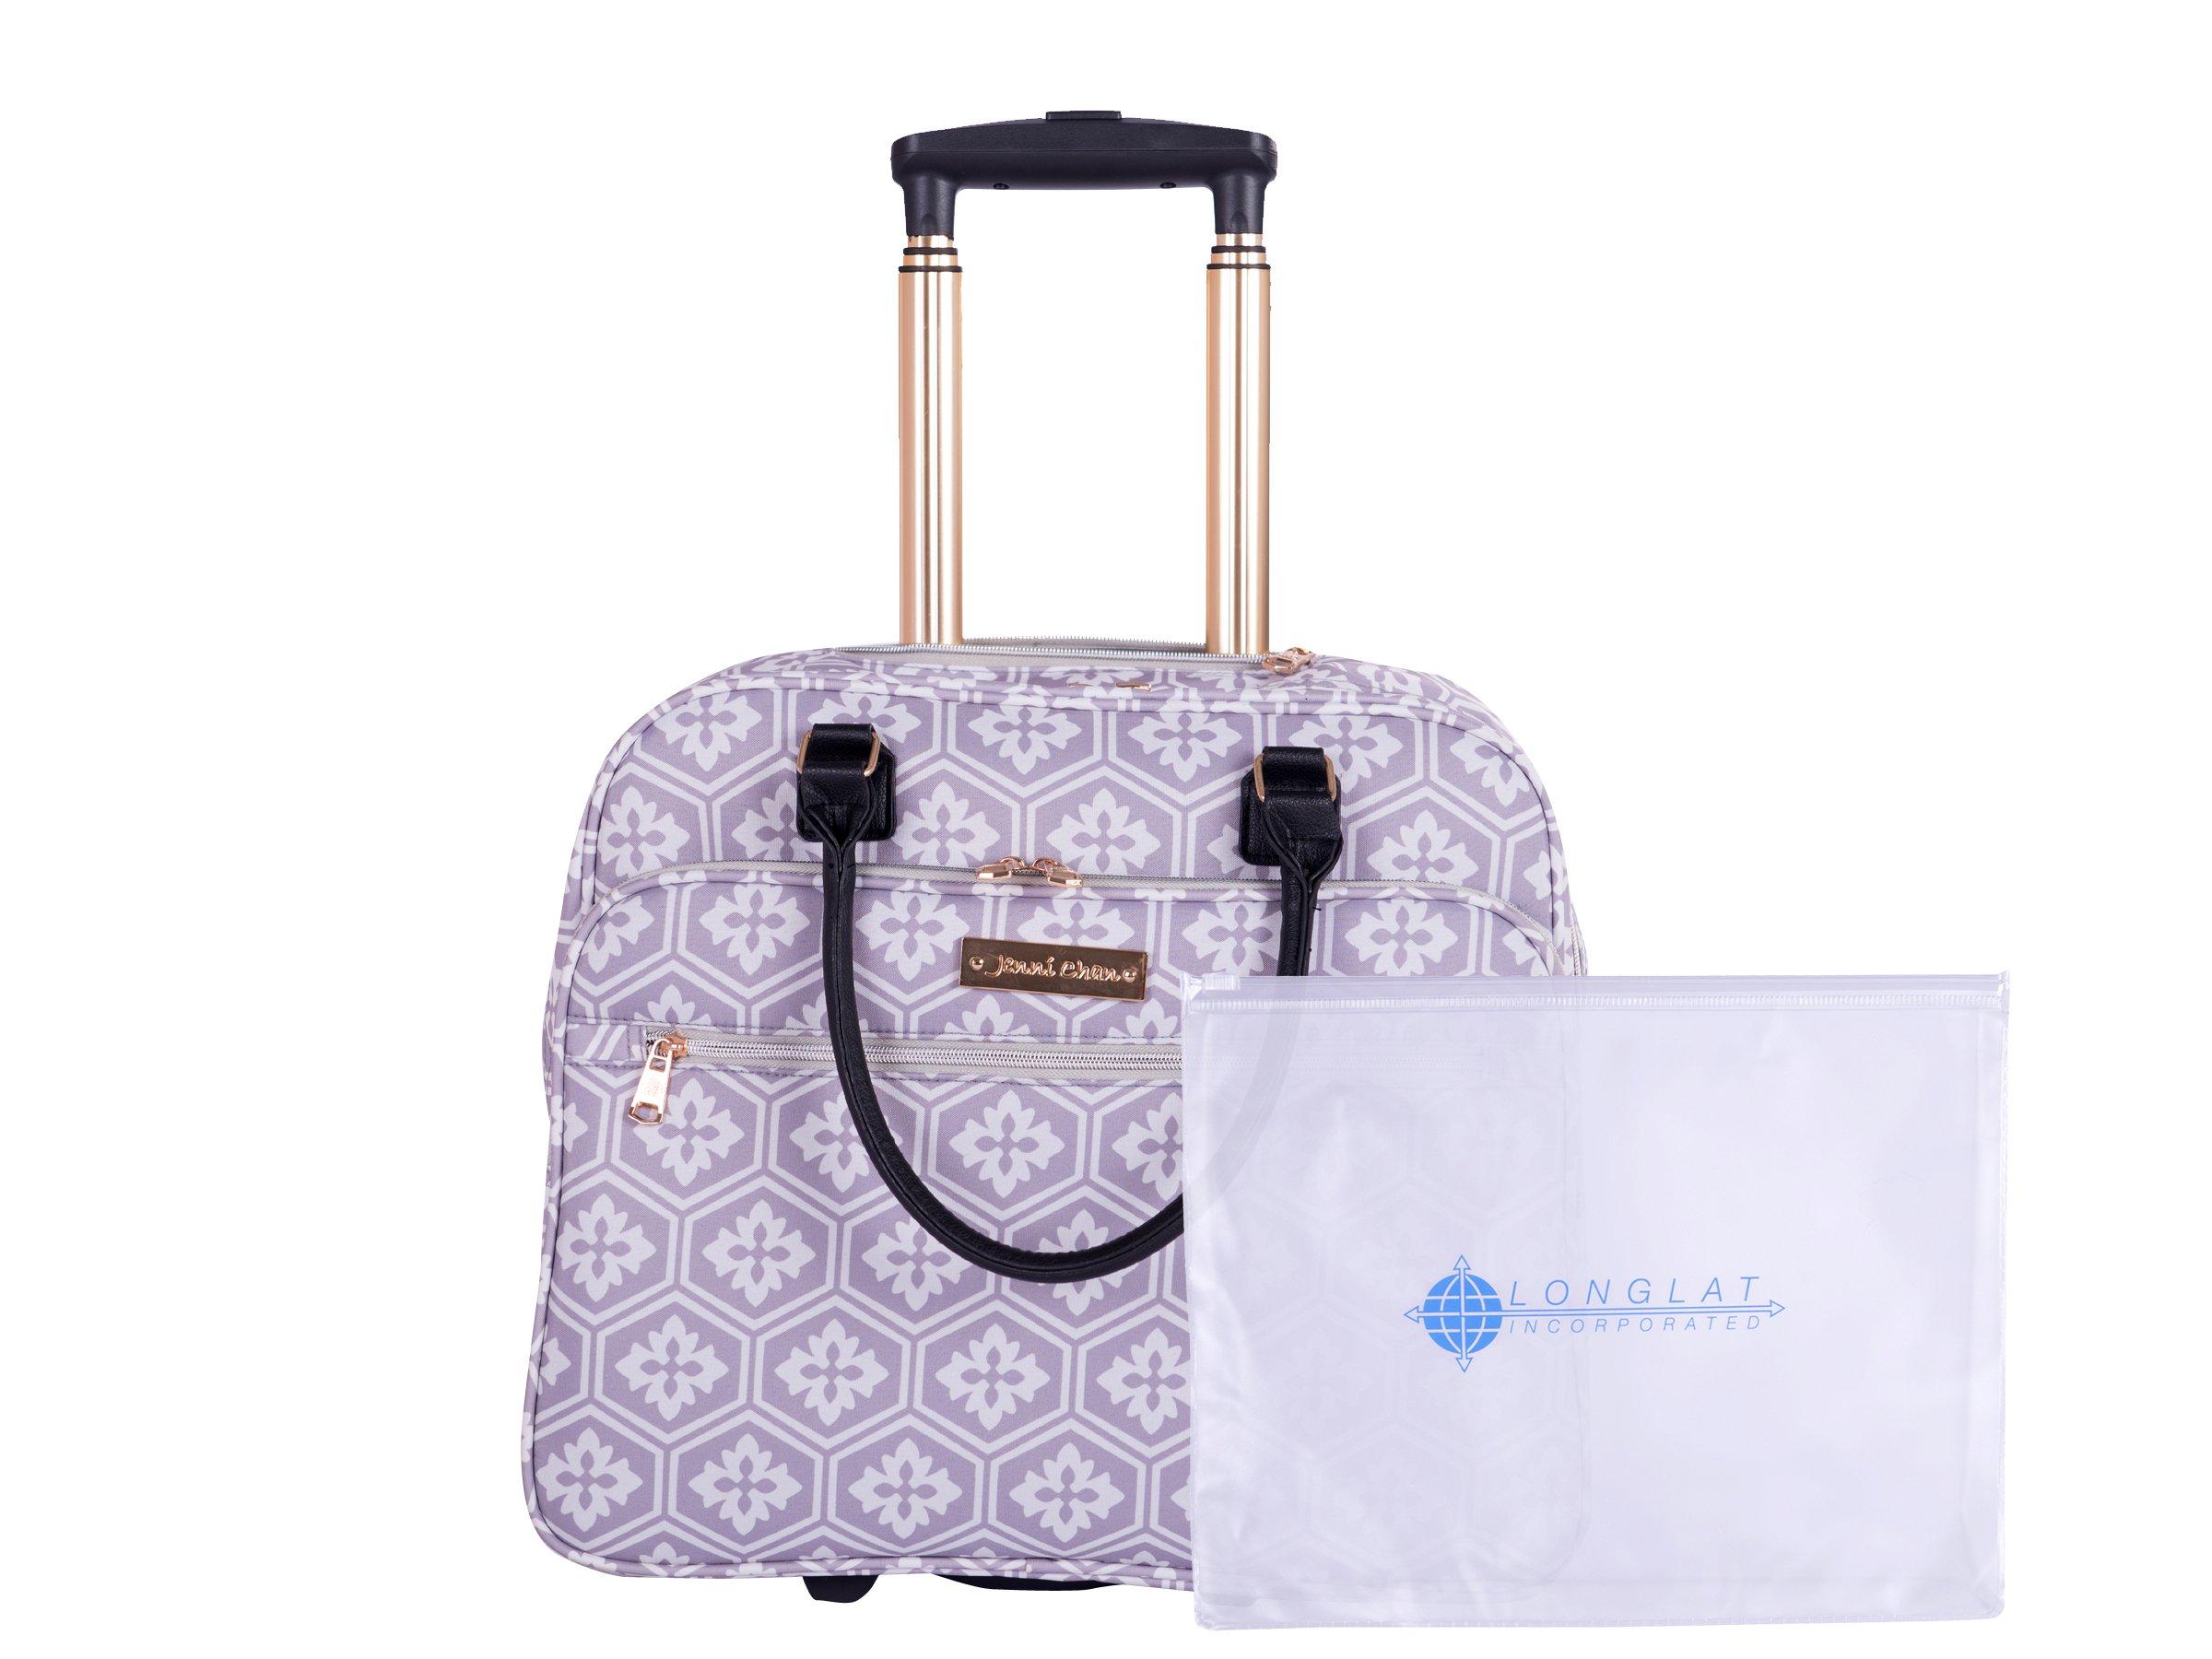 Jenni Chan Adra 2-Piece Set Business 311 Bag Travel Tote, Grey, One Size